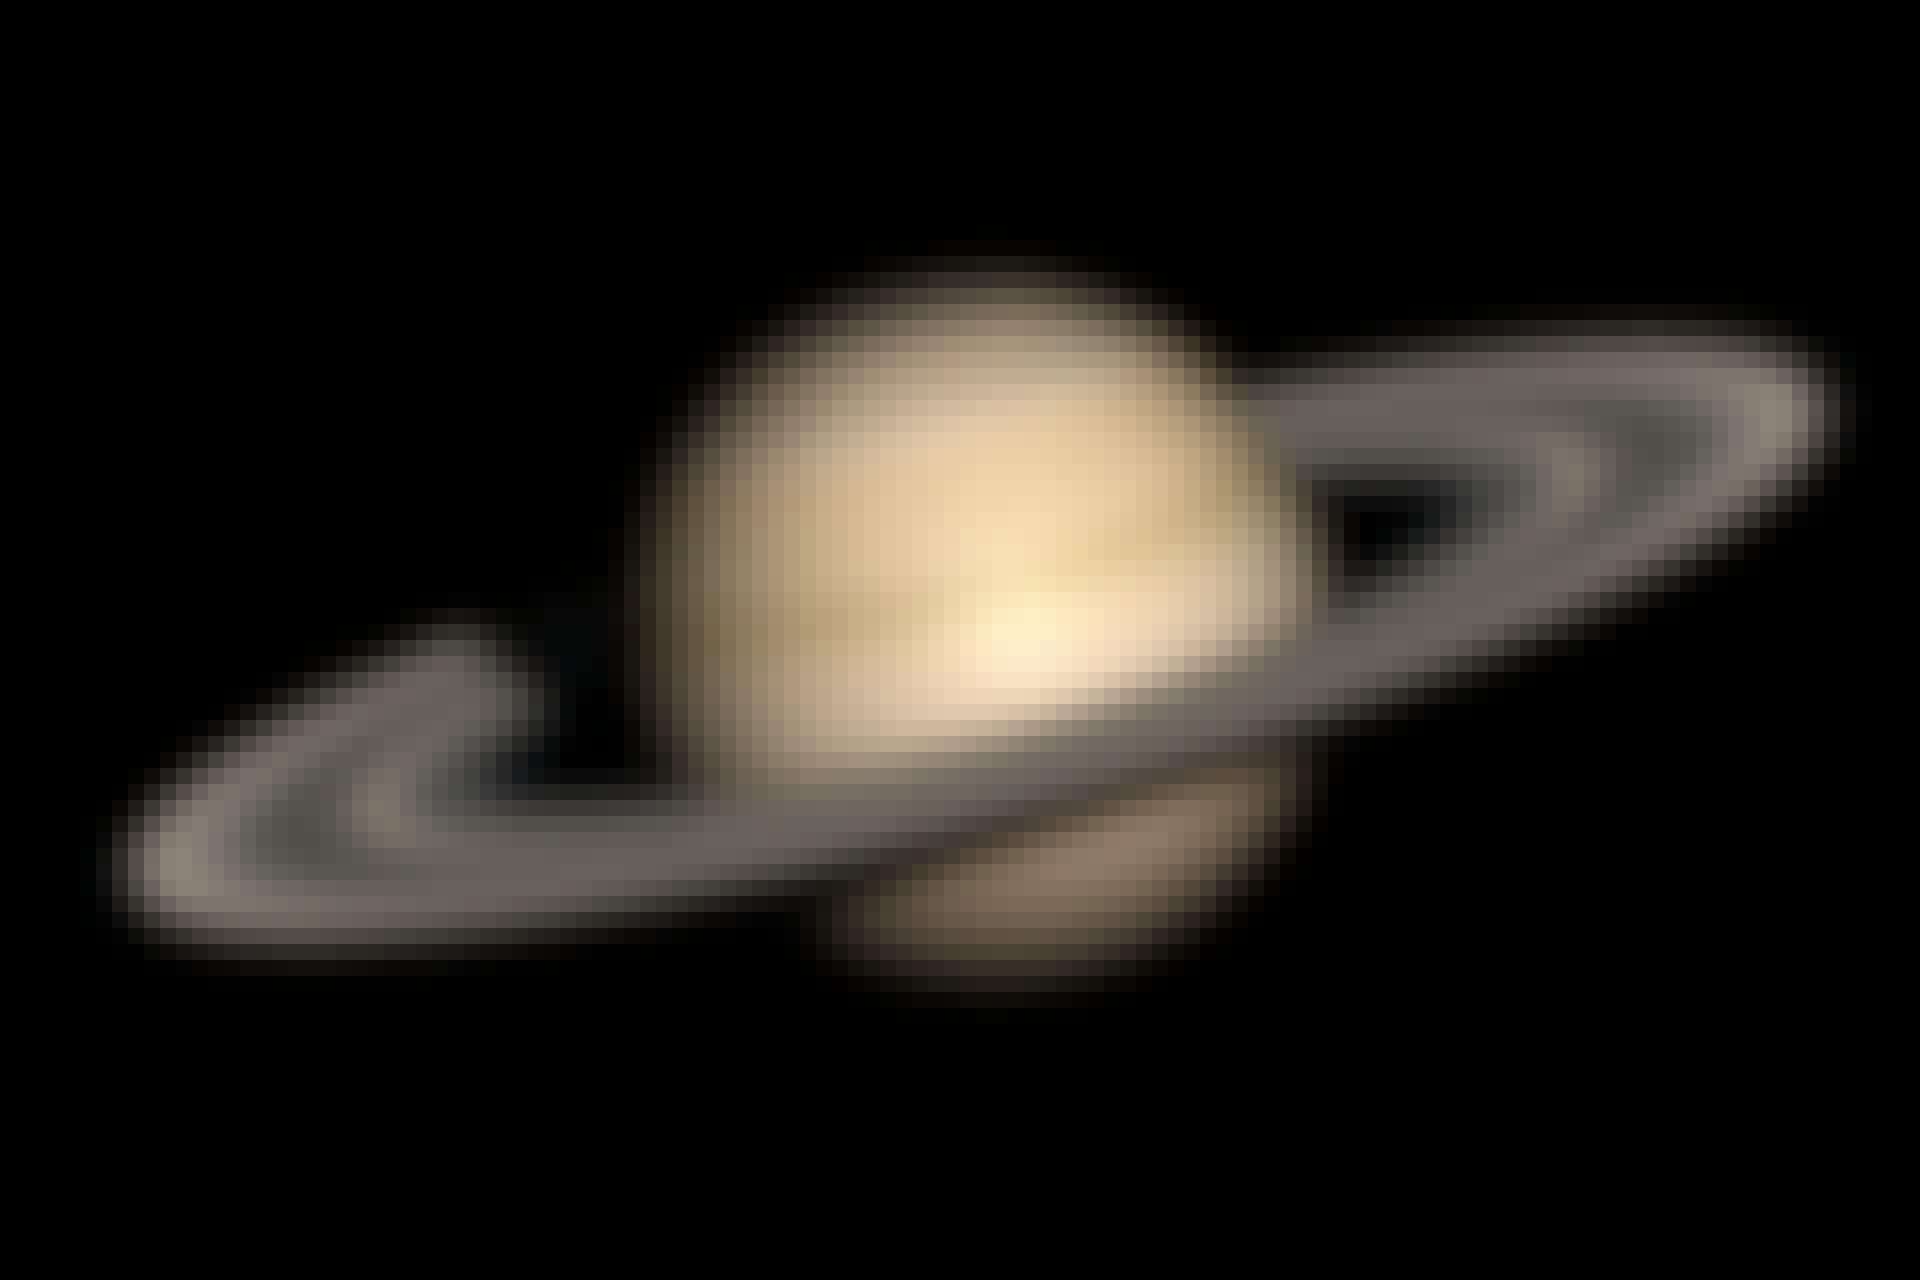 Saturn top